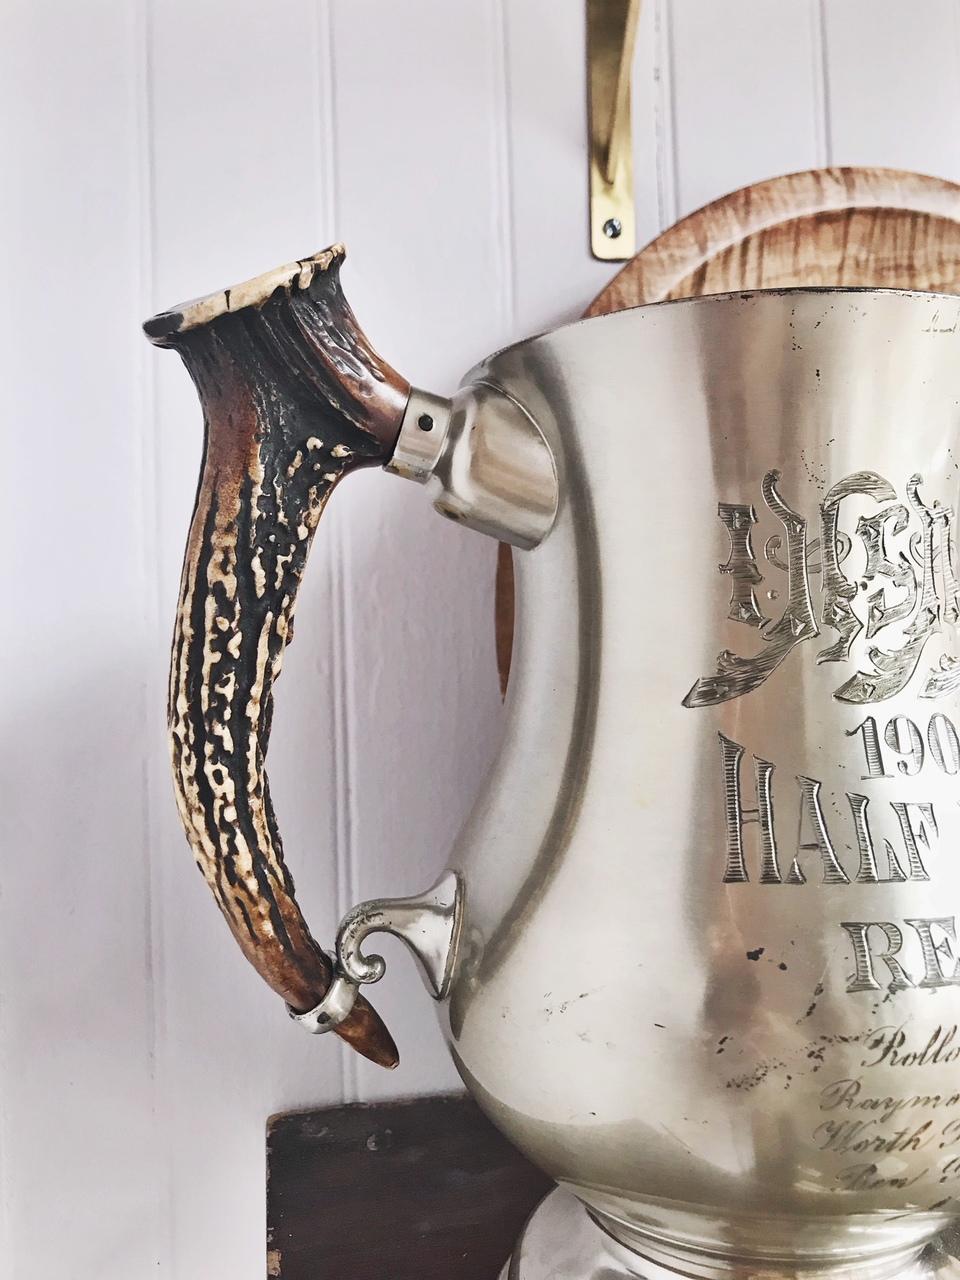 Antique 1908 Trophy with Antler Handles